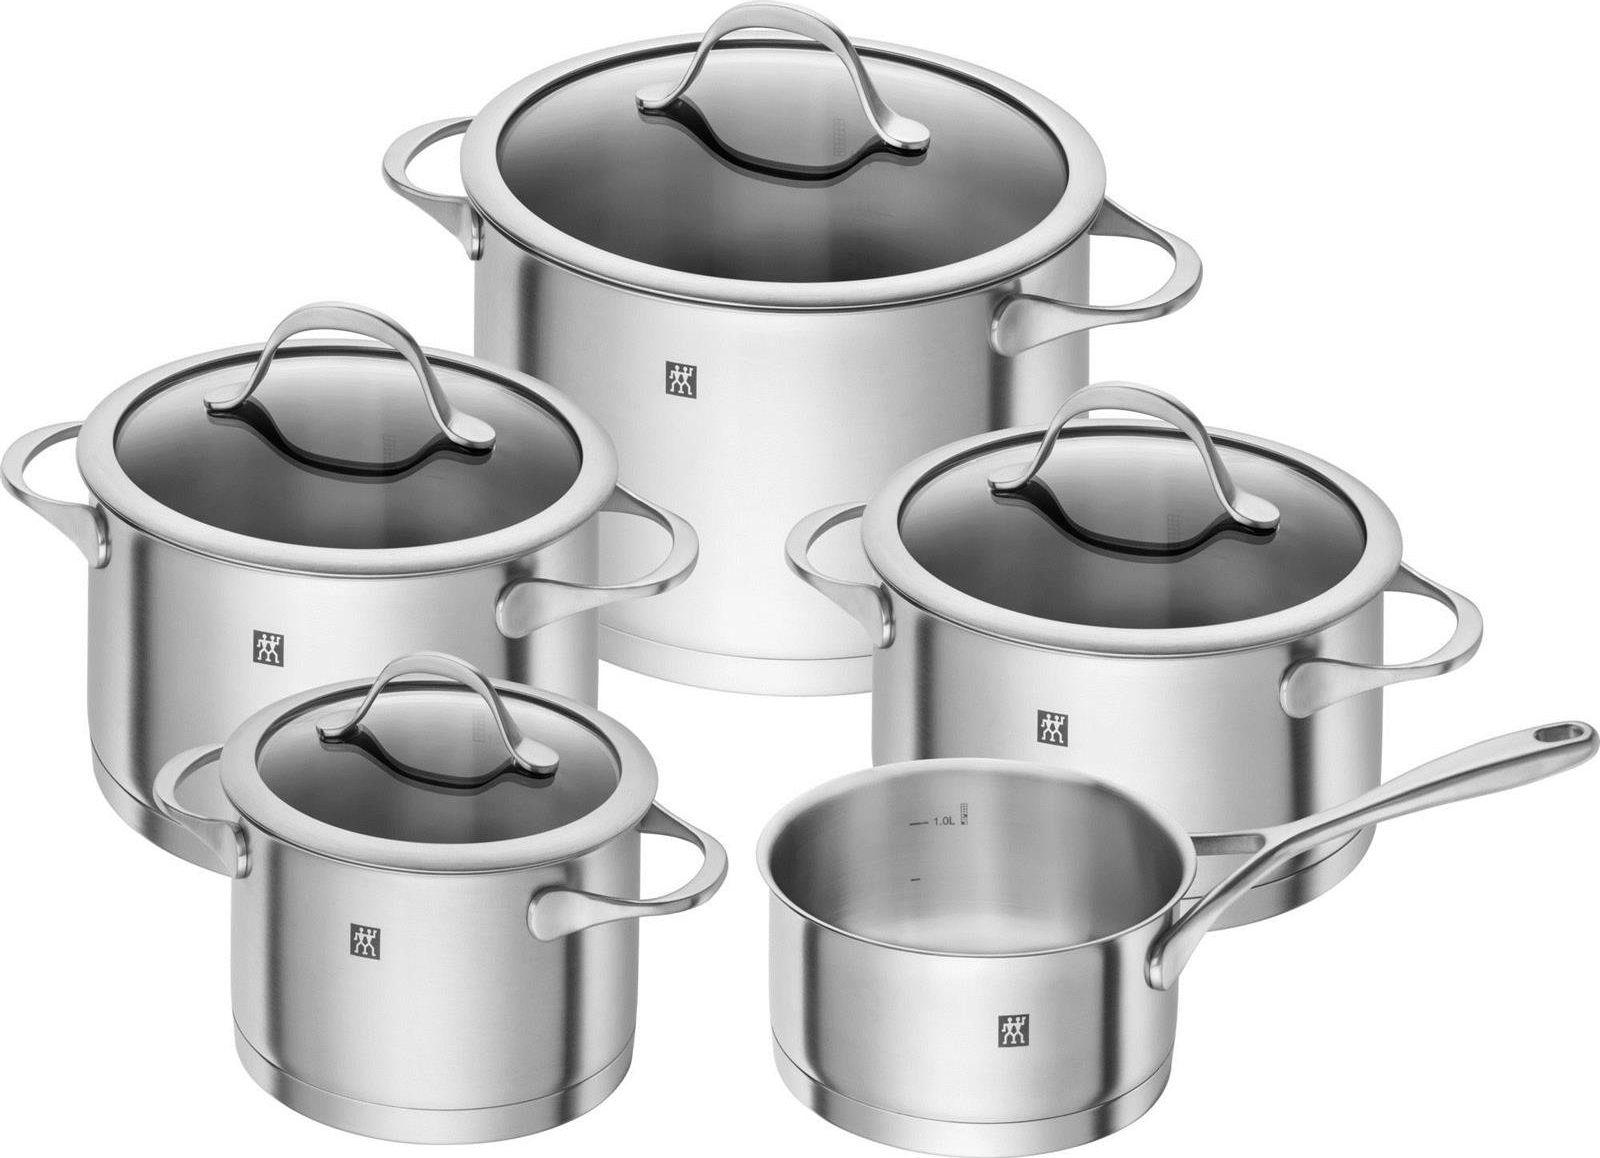 ZWILLING Essence pan set 5 pc(s) 66220-002-0 Pannas un katli